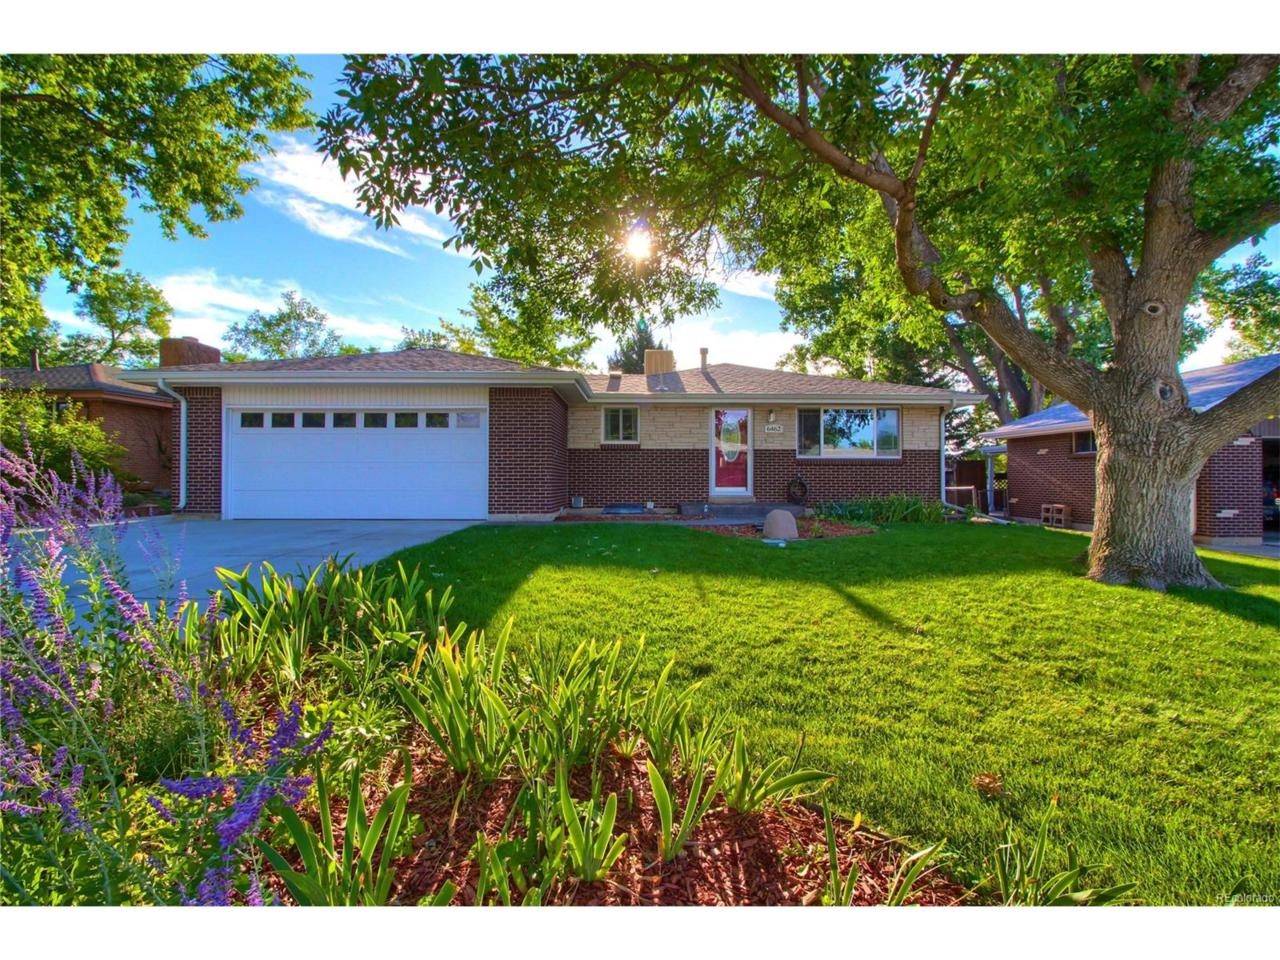 6462 Zephyr Street, Arvada, CO 80004 (MLS #2800522) :: 8z Real Estate